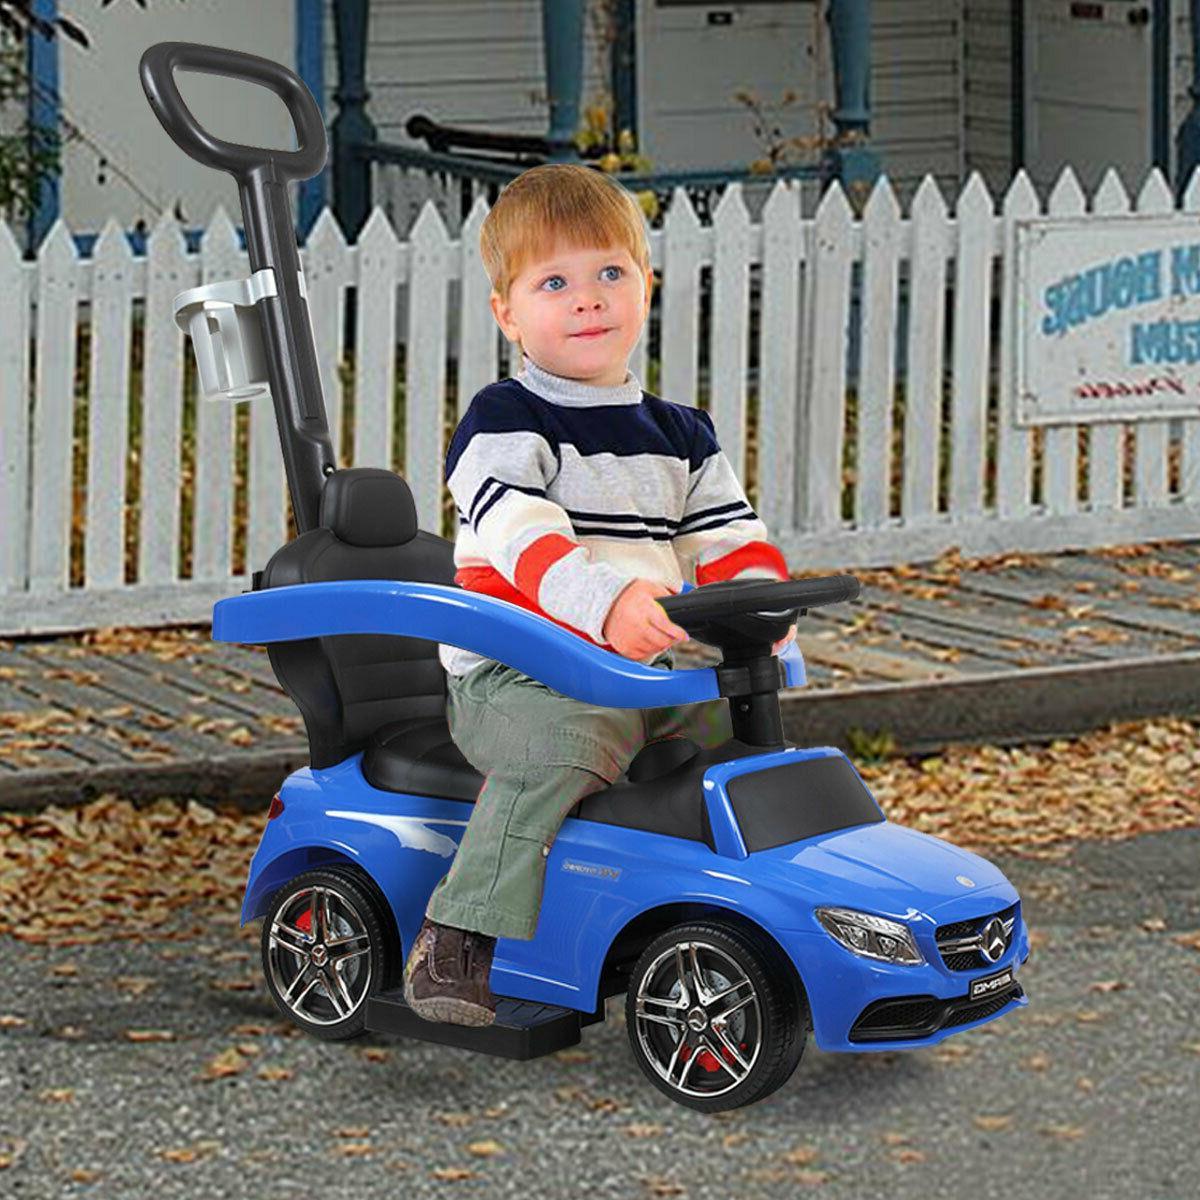 Licensed Mercedes Ride Push Stroller w/push rod